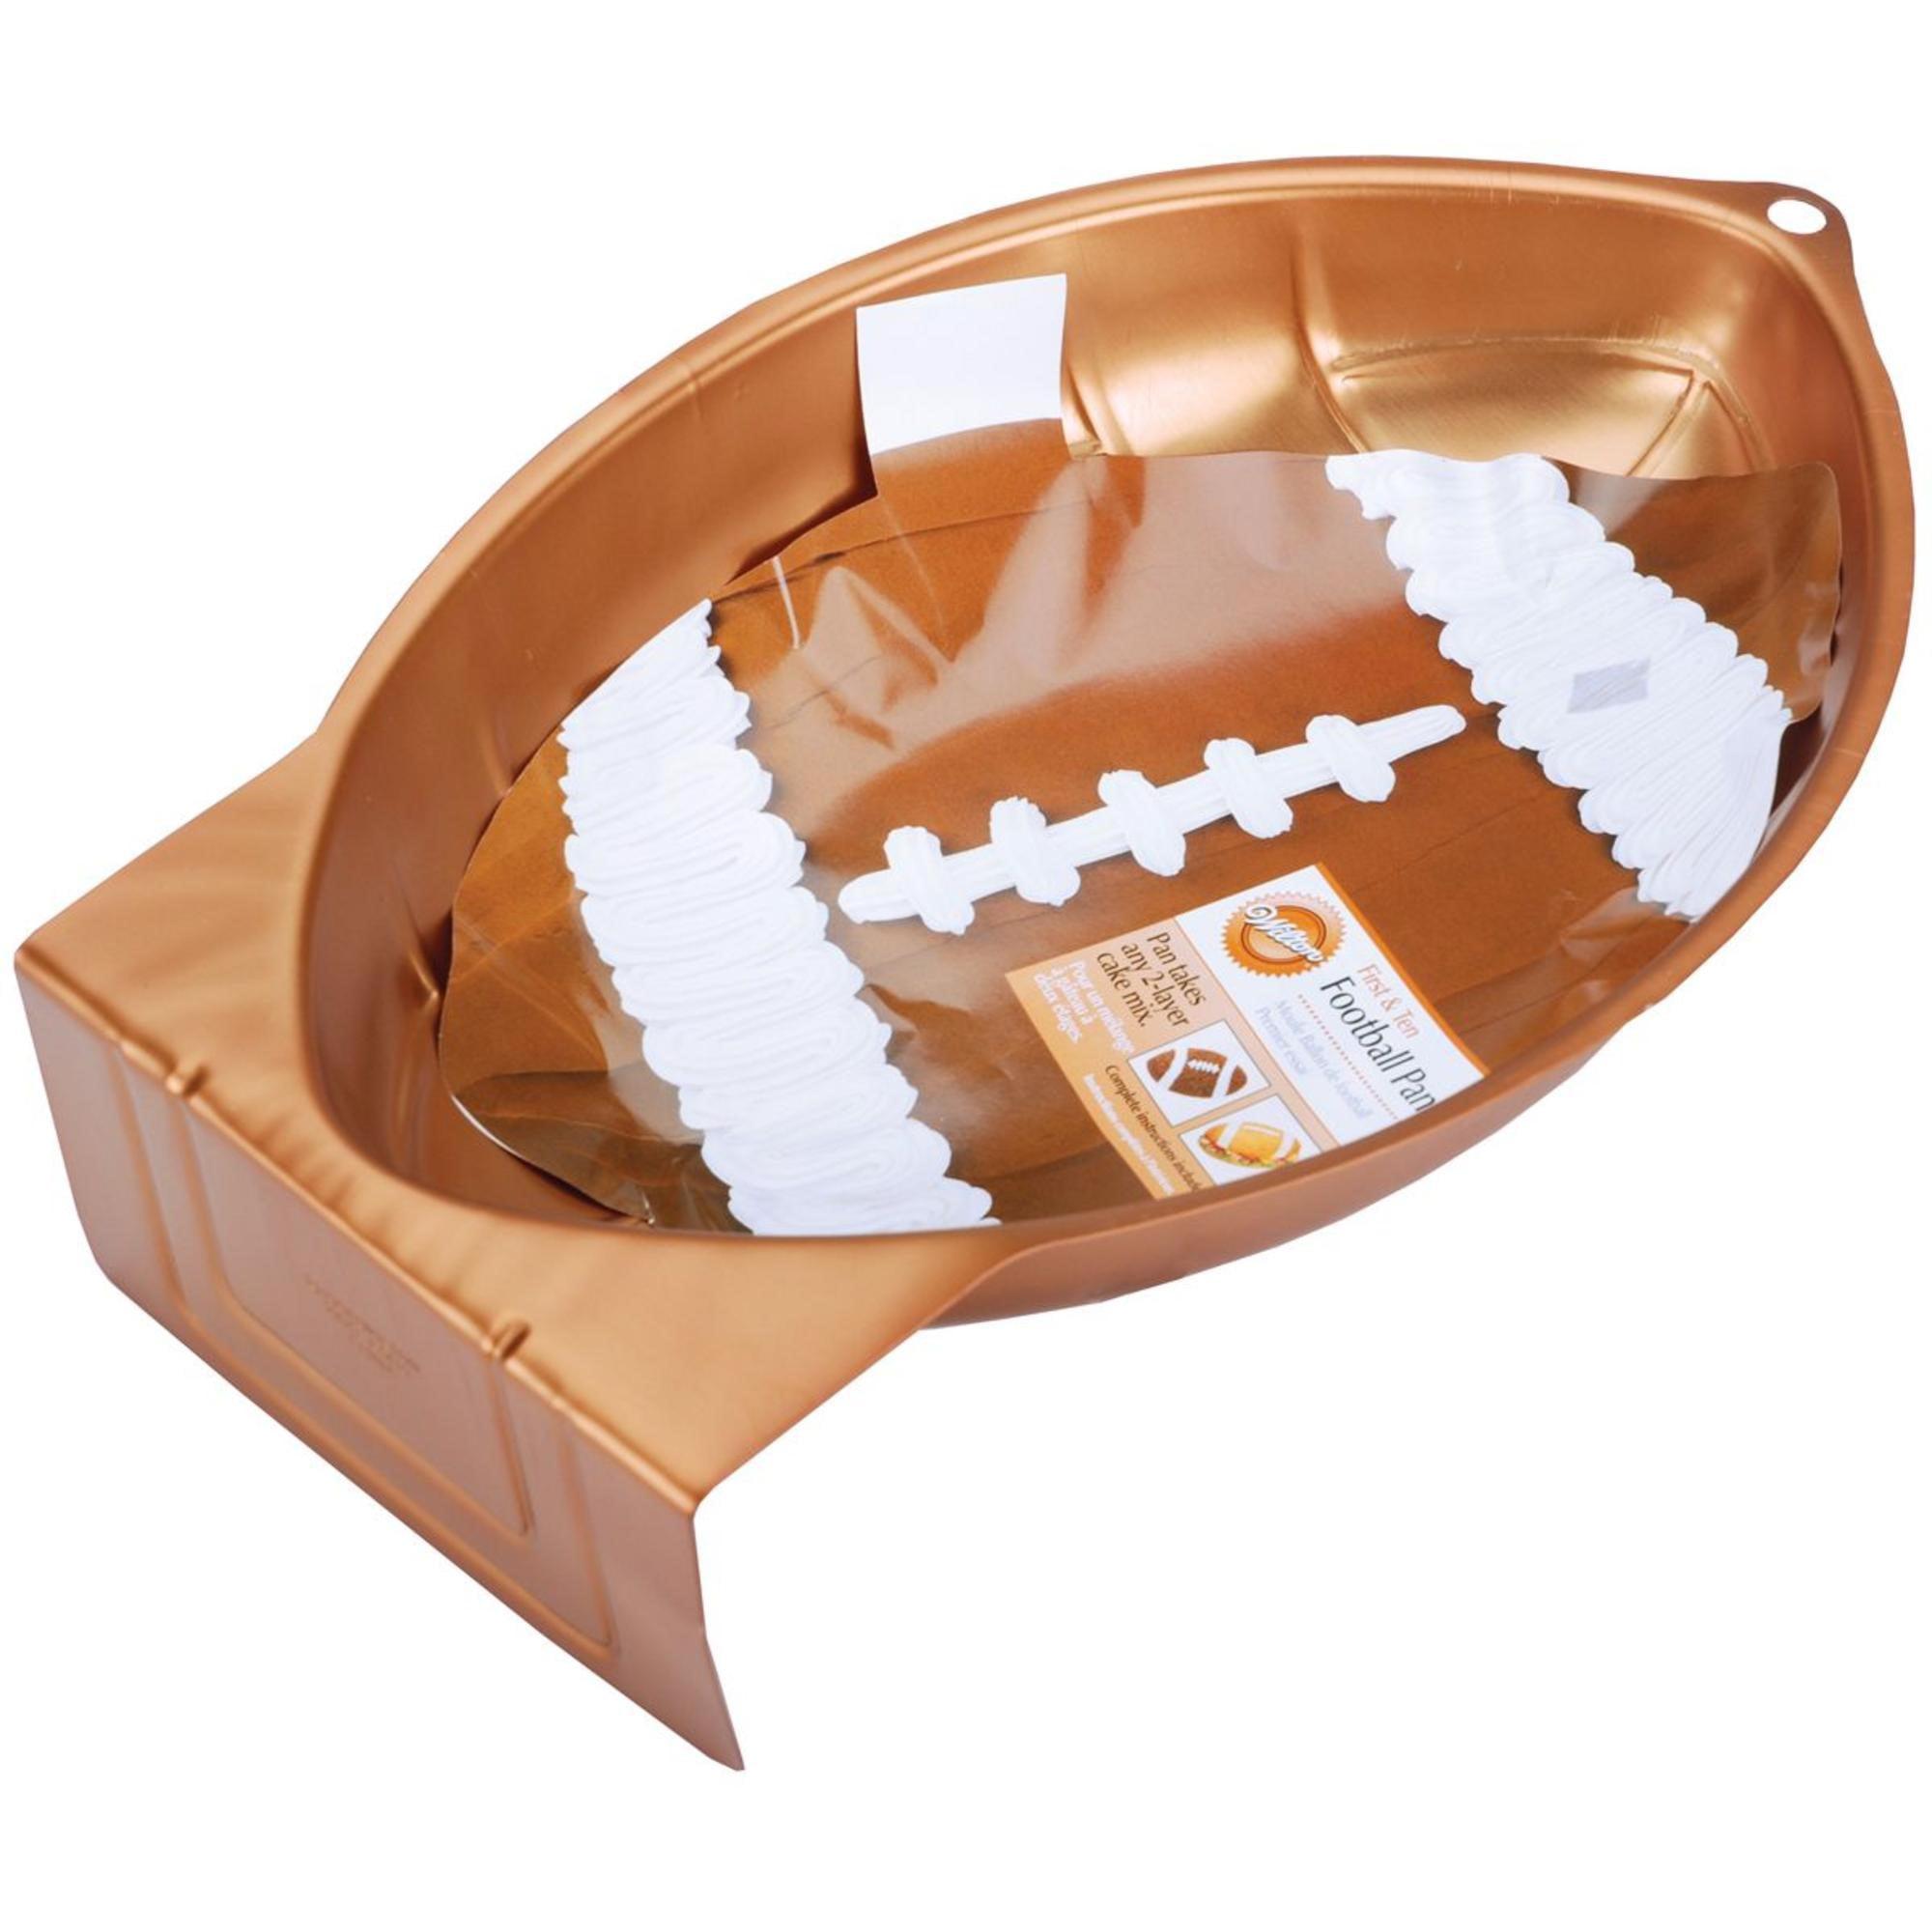 Wilton Football Cake Pan Walmartcom